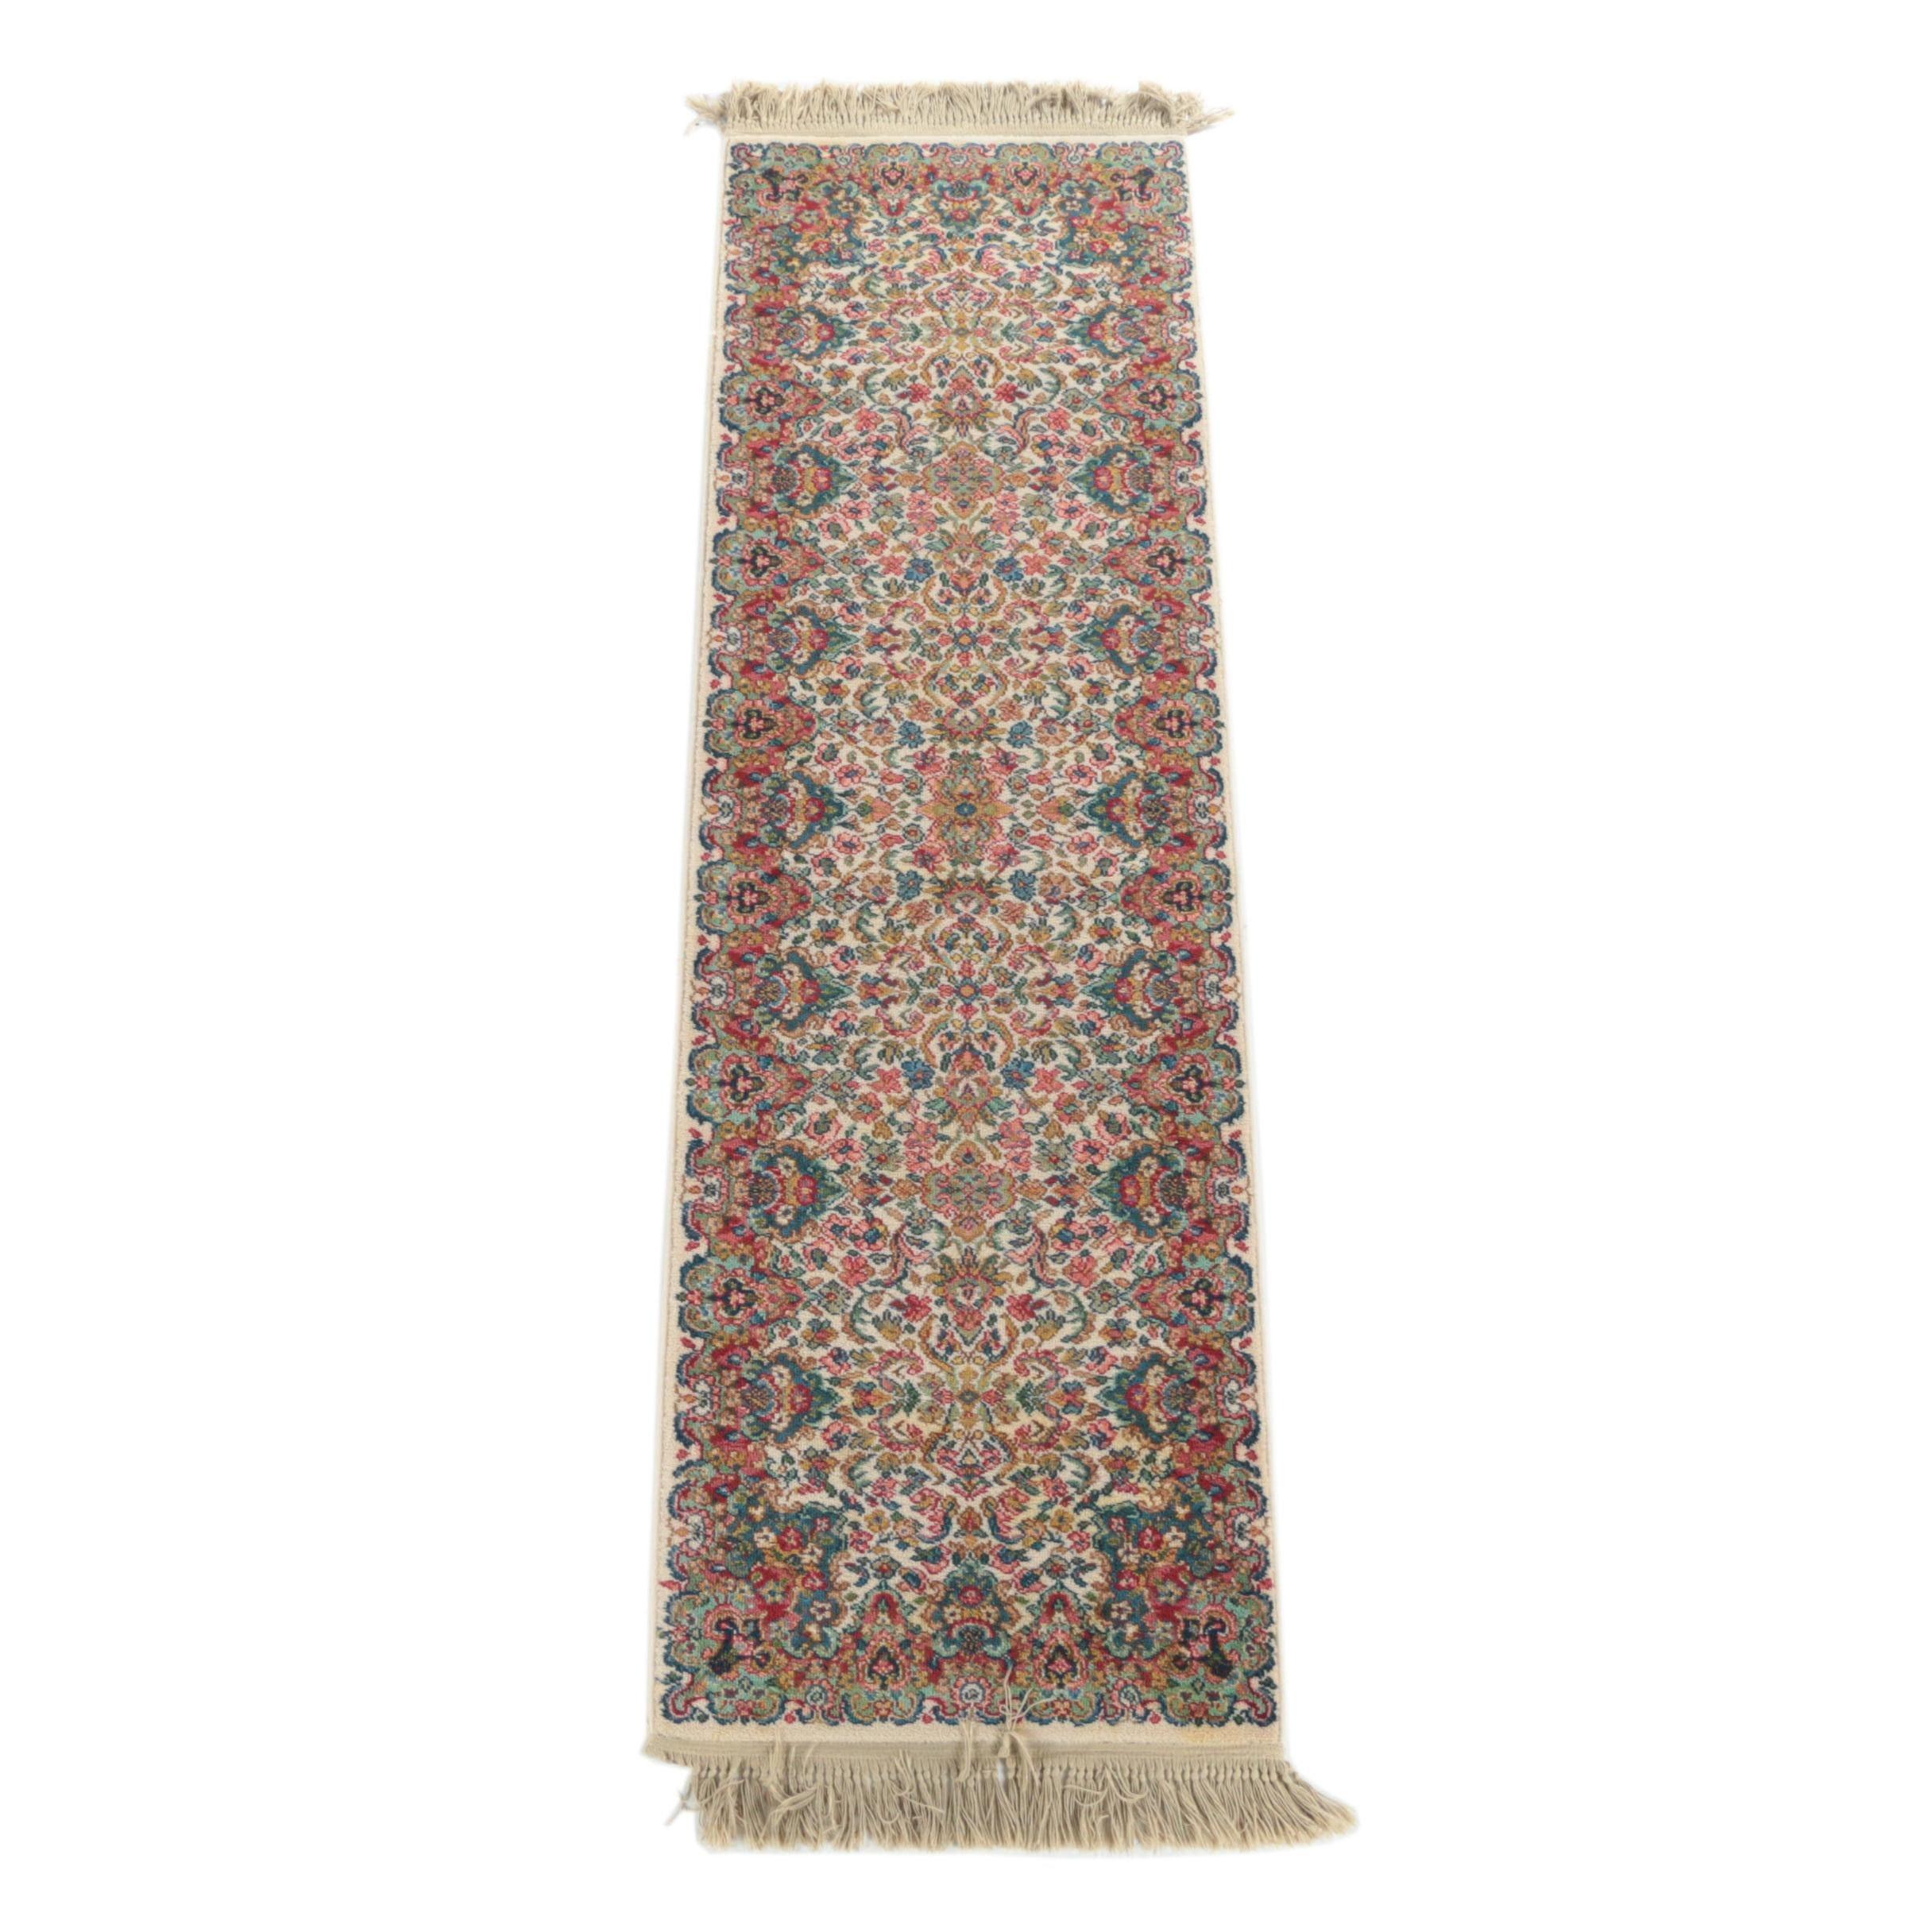 "Karastan ""Floral Kirman"" Carpet Runner"